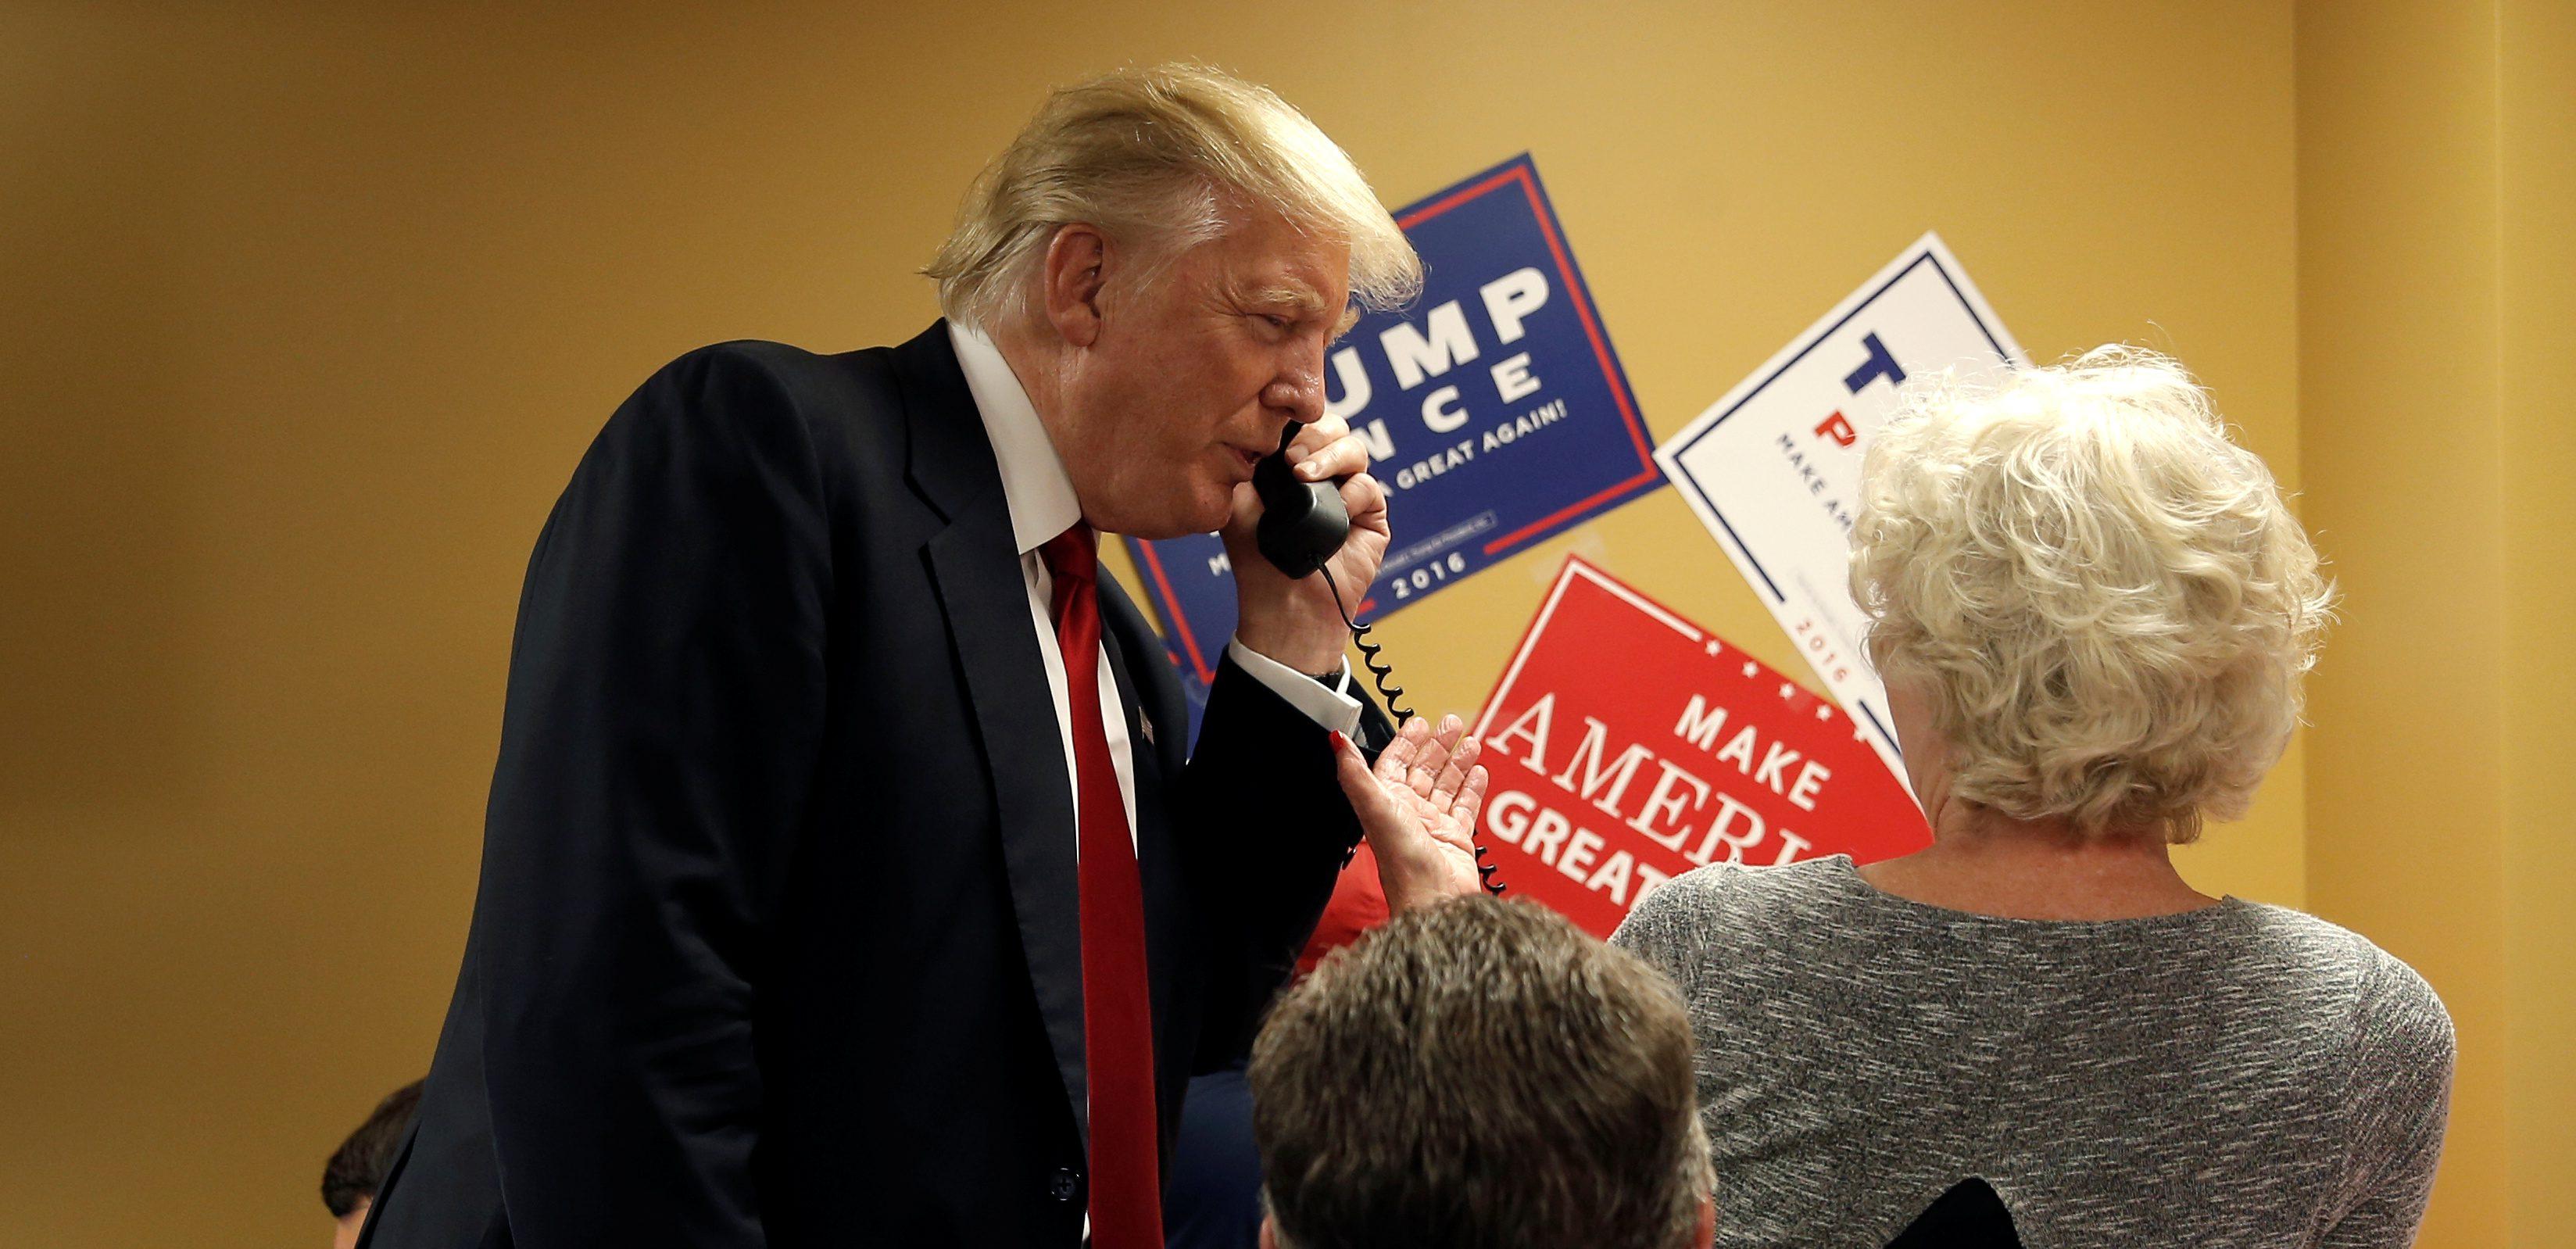 Donald Trump call to Mauricio Macri, Eric Trump helped arrange